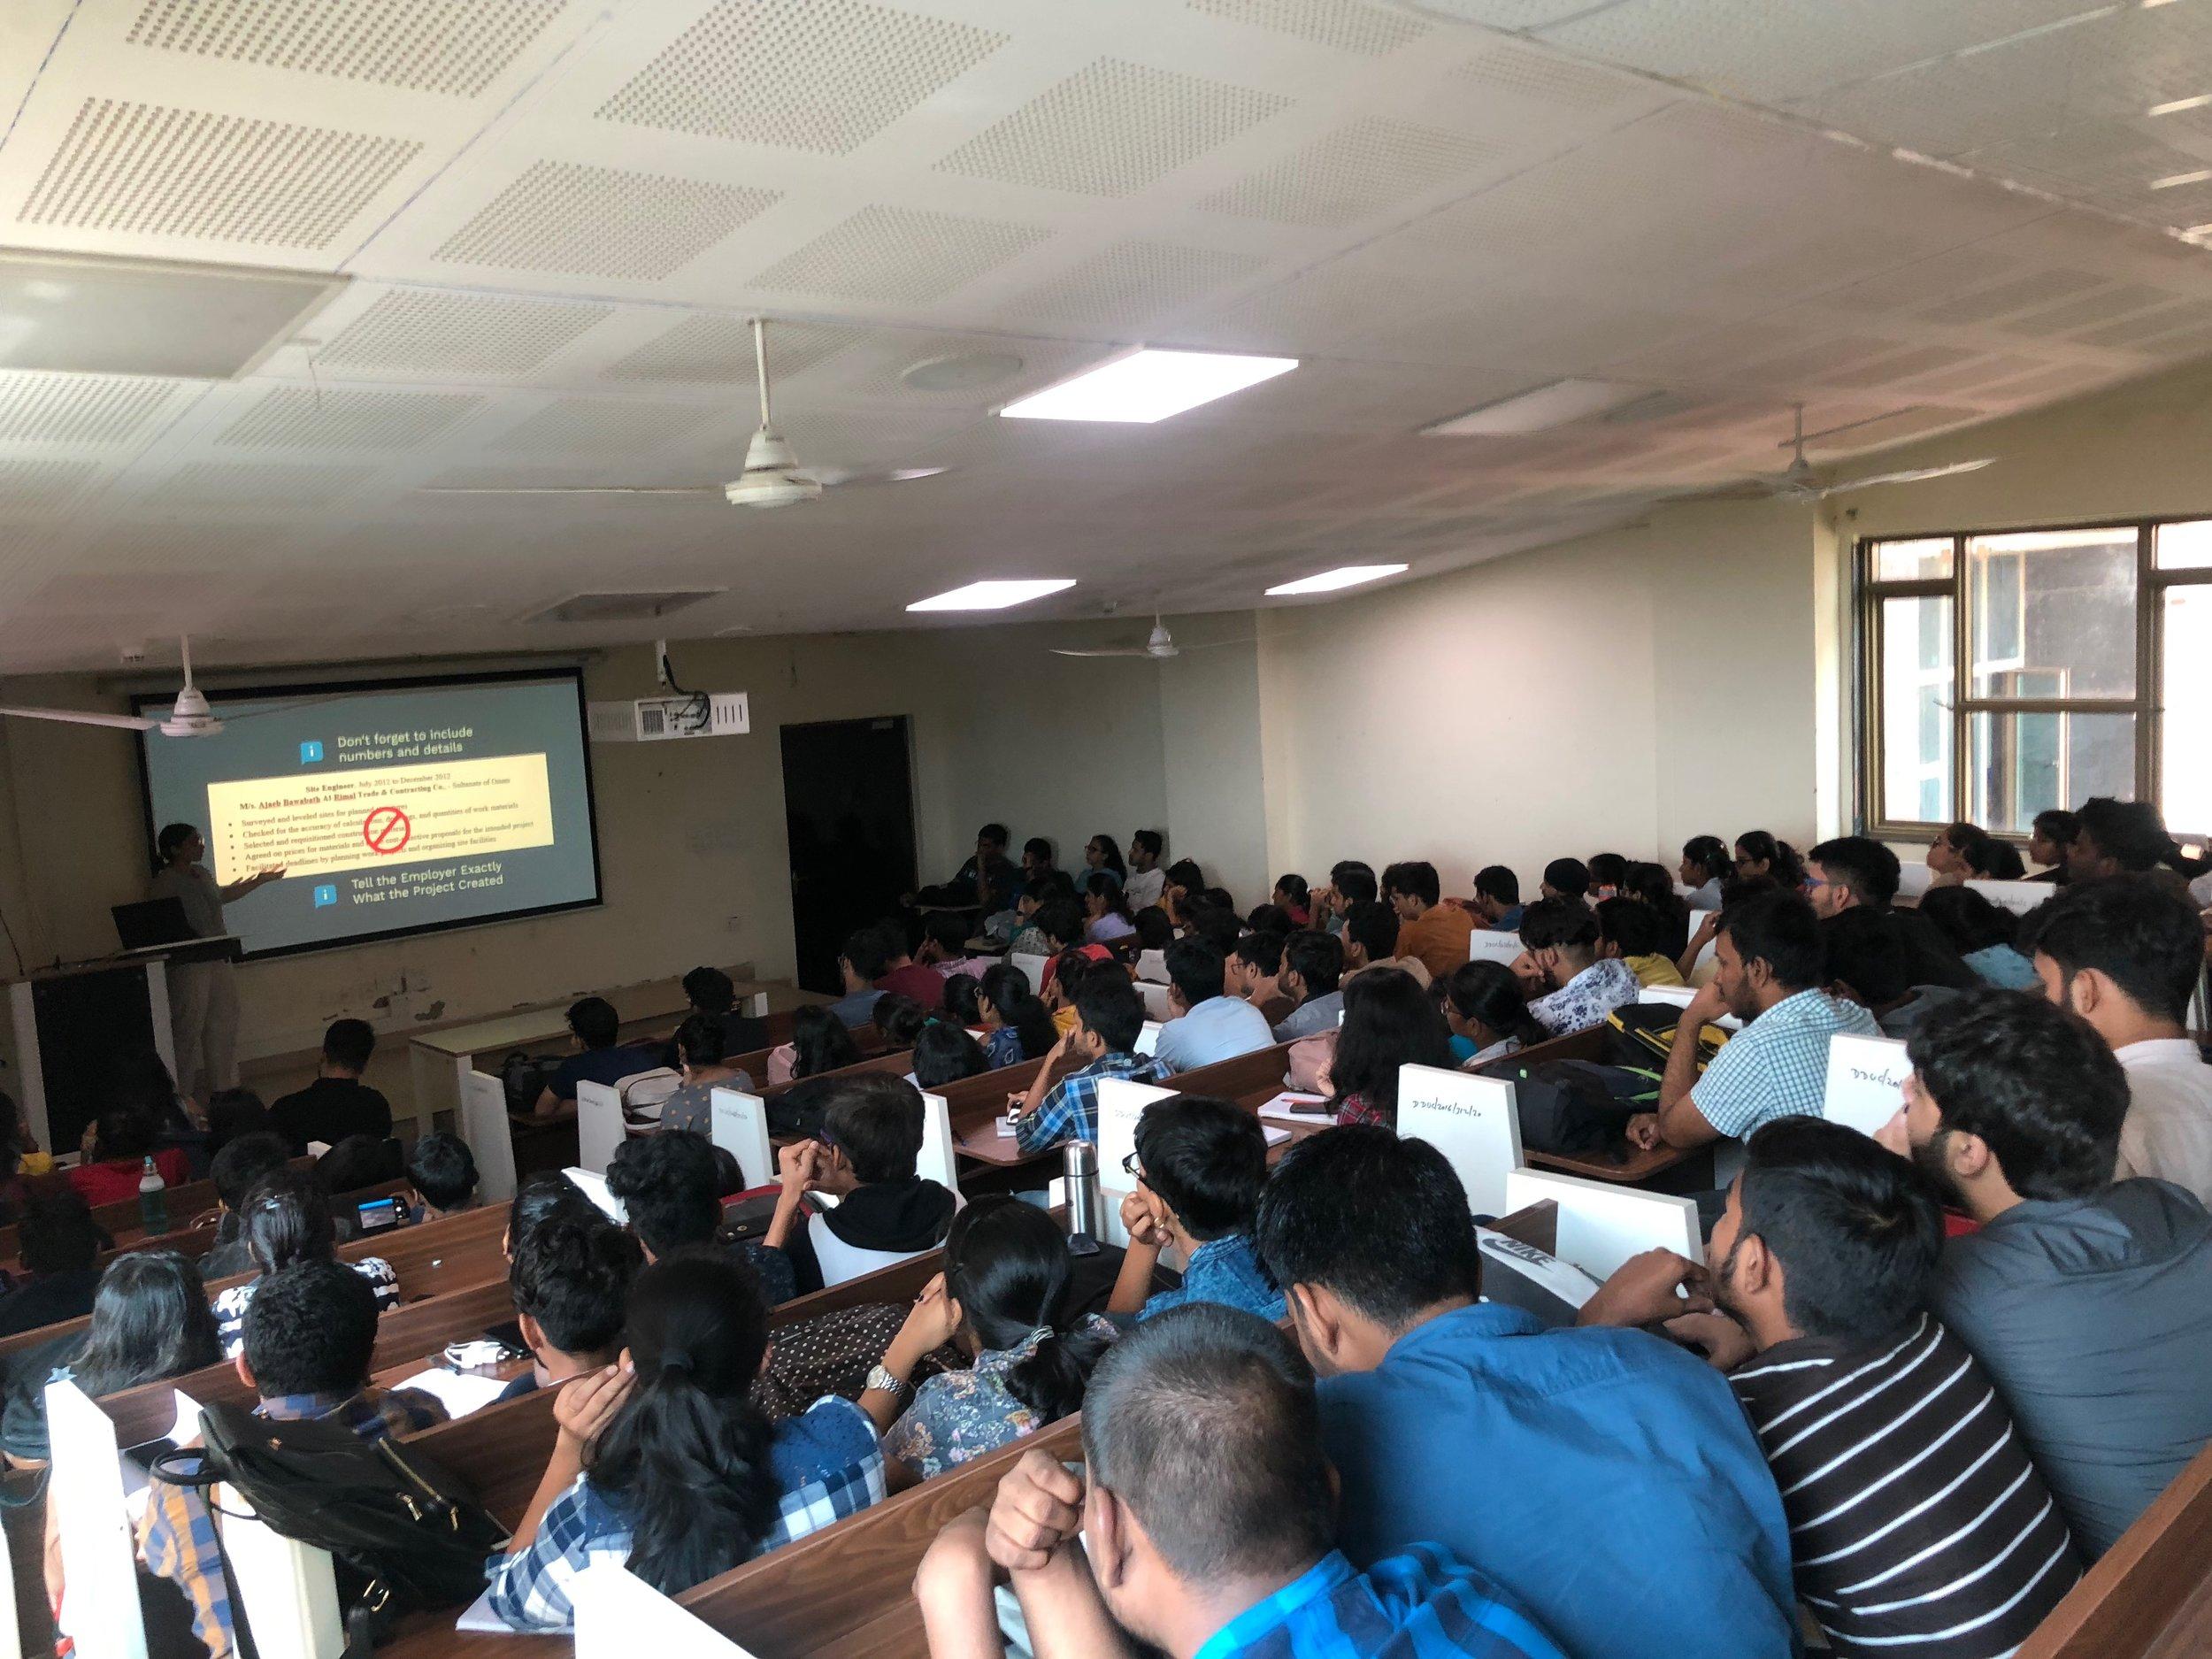 Deen Dayal Upadhyaya College, University of Delhi